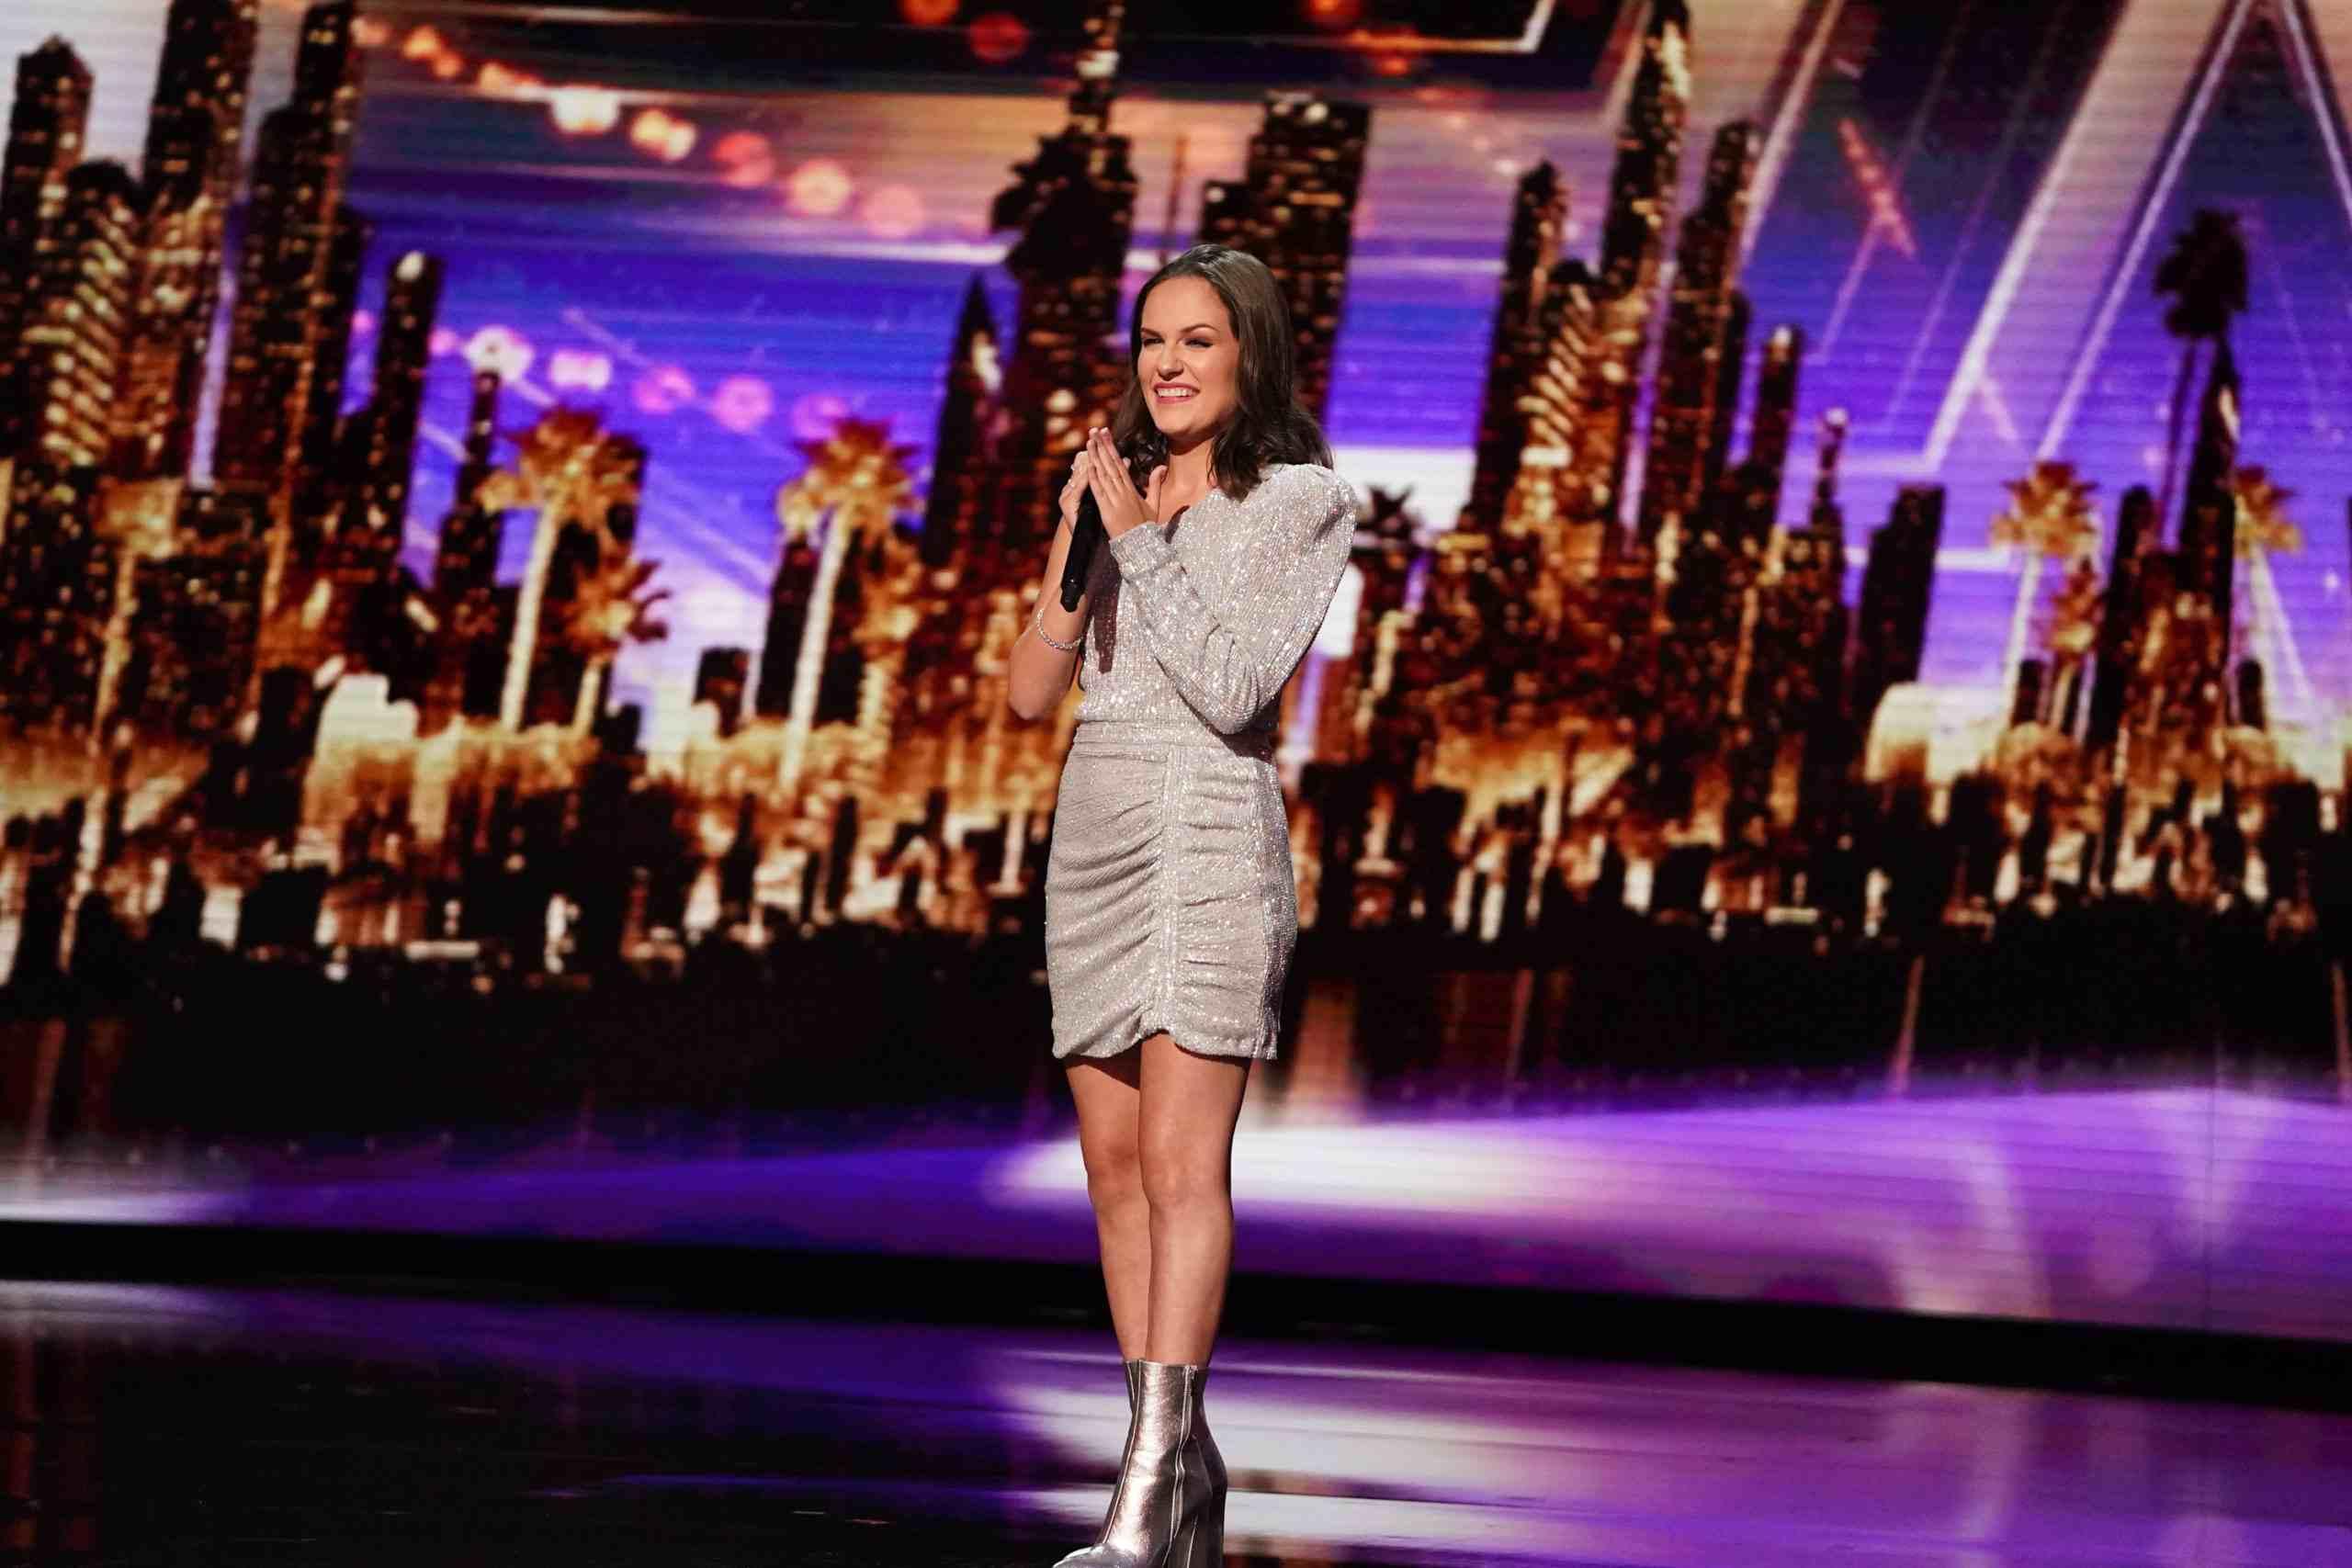 America's Got Talent Season 16 Episode 13